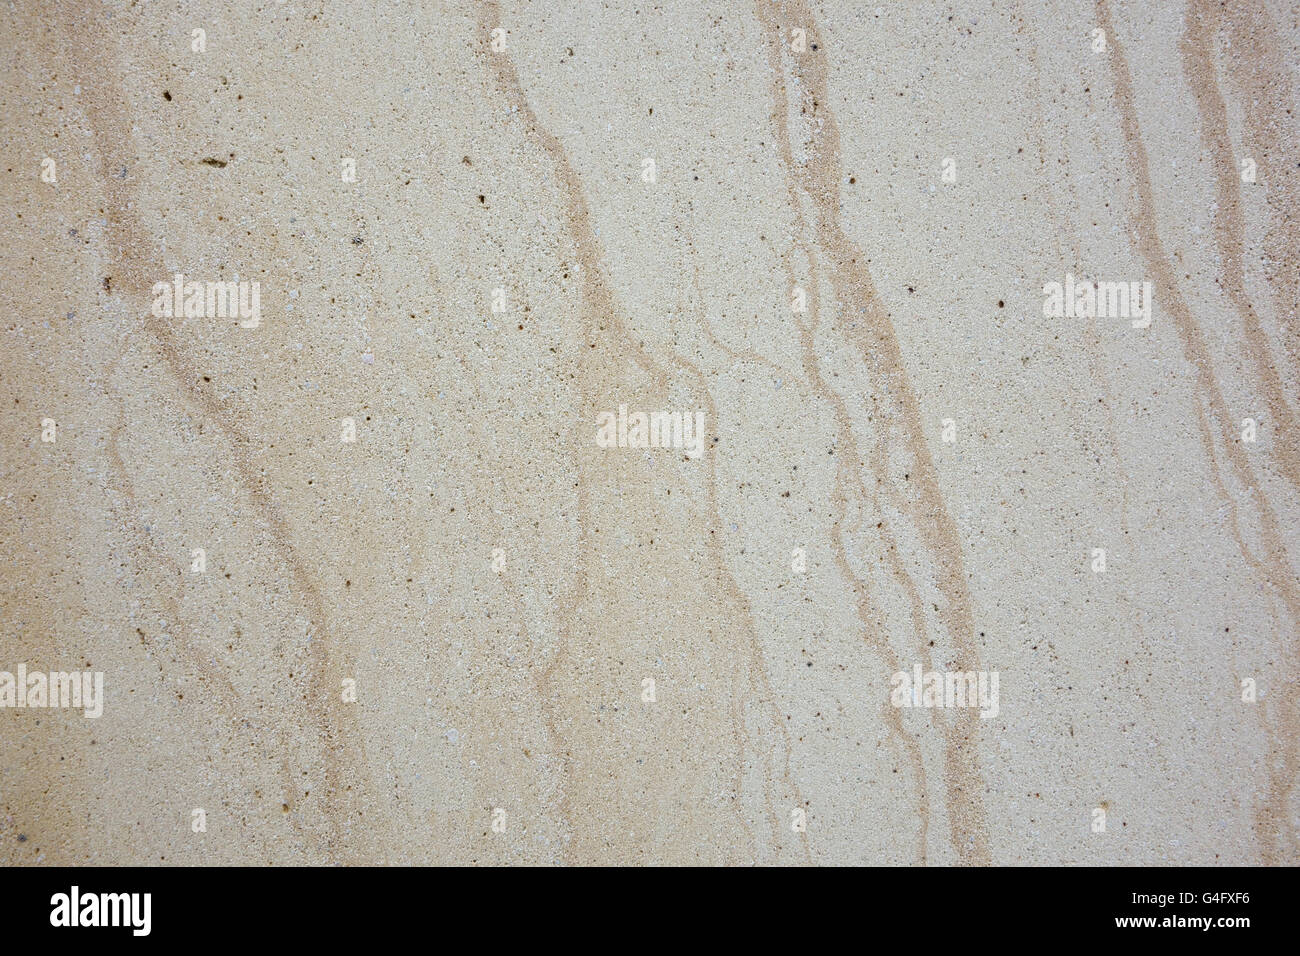 Finely textured worn veined marble travertine stone background Stock Photo